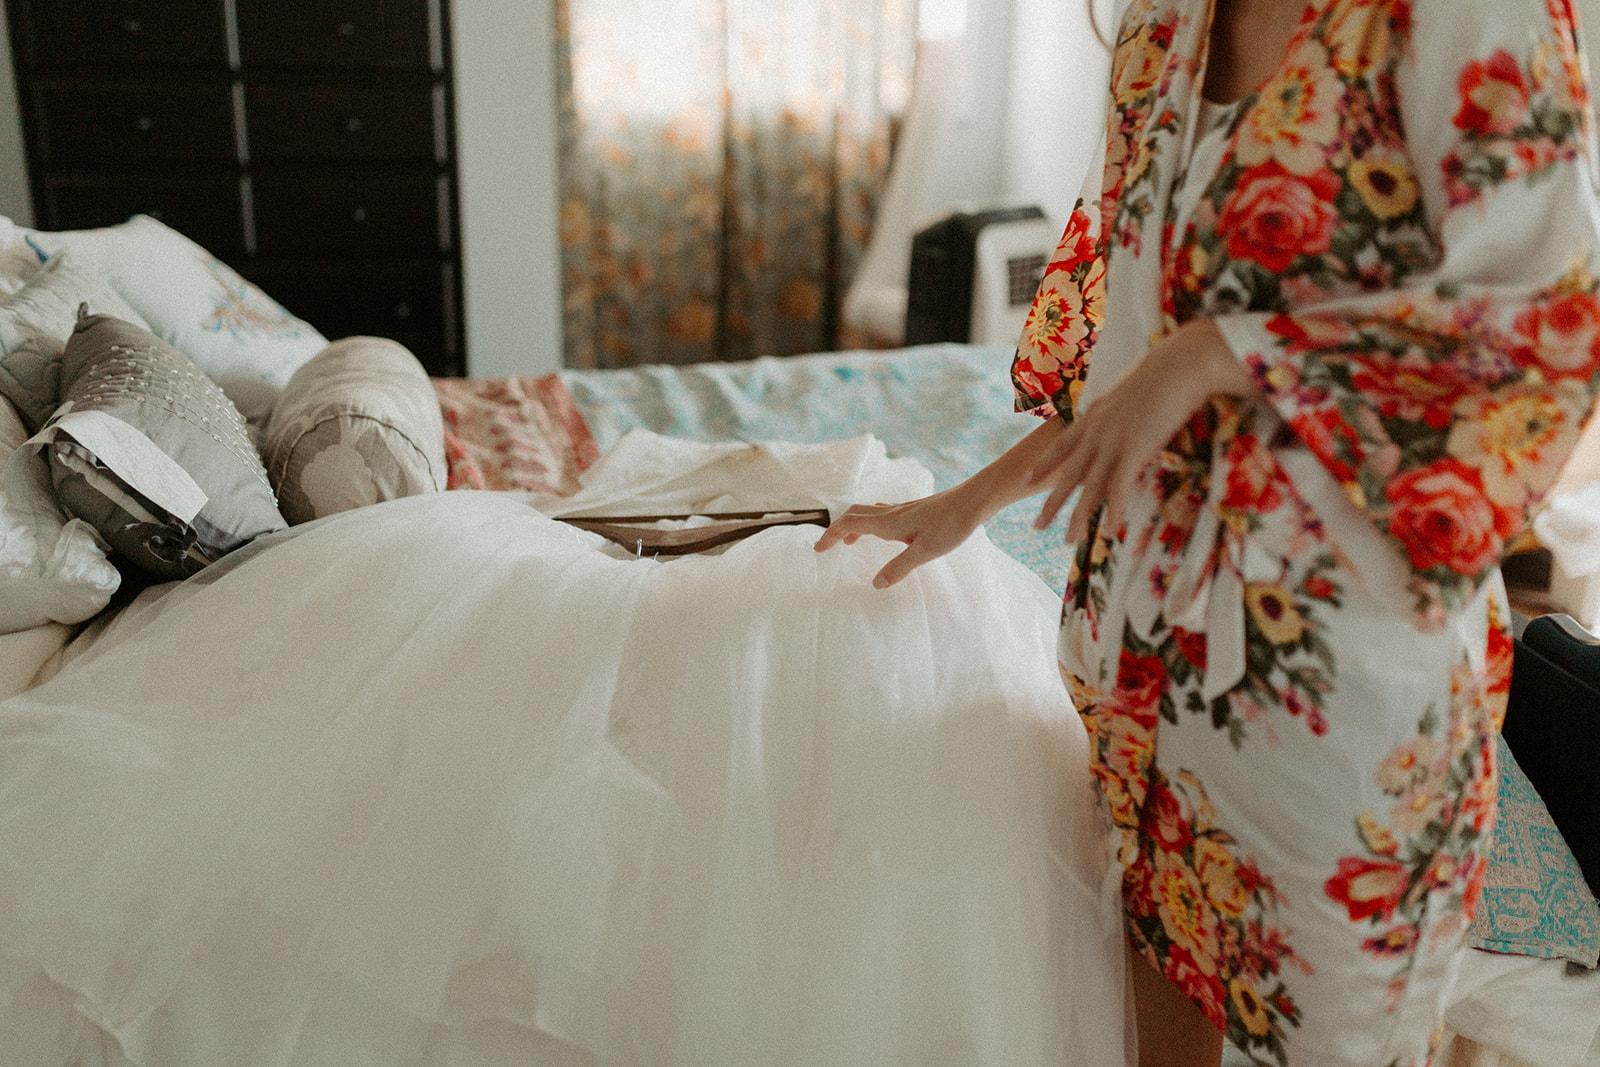 camp_wokanda_peoria_illinois_wedding_photographer_wright_photographs_bliese_0049_websize.jpg